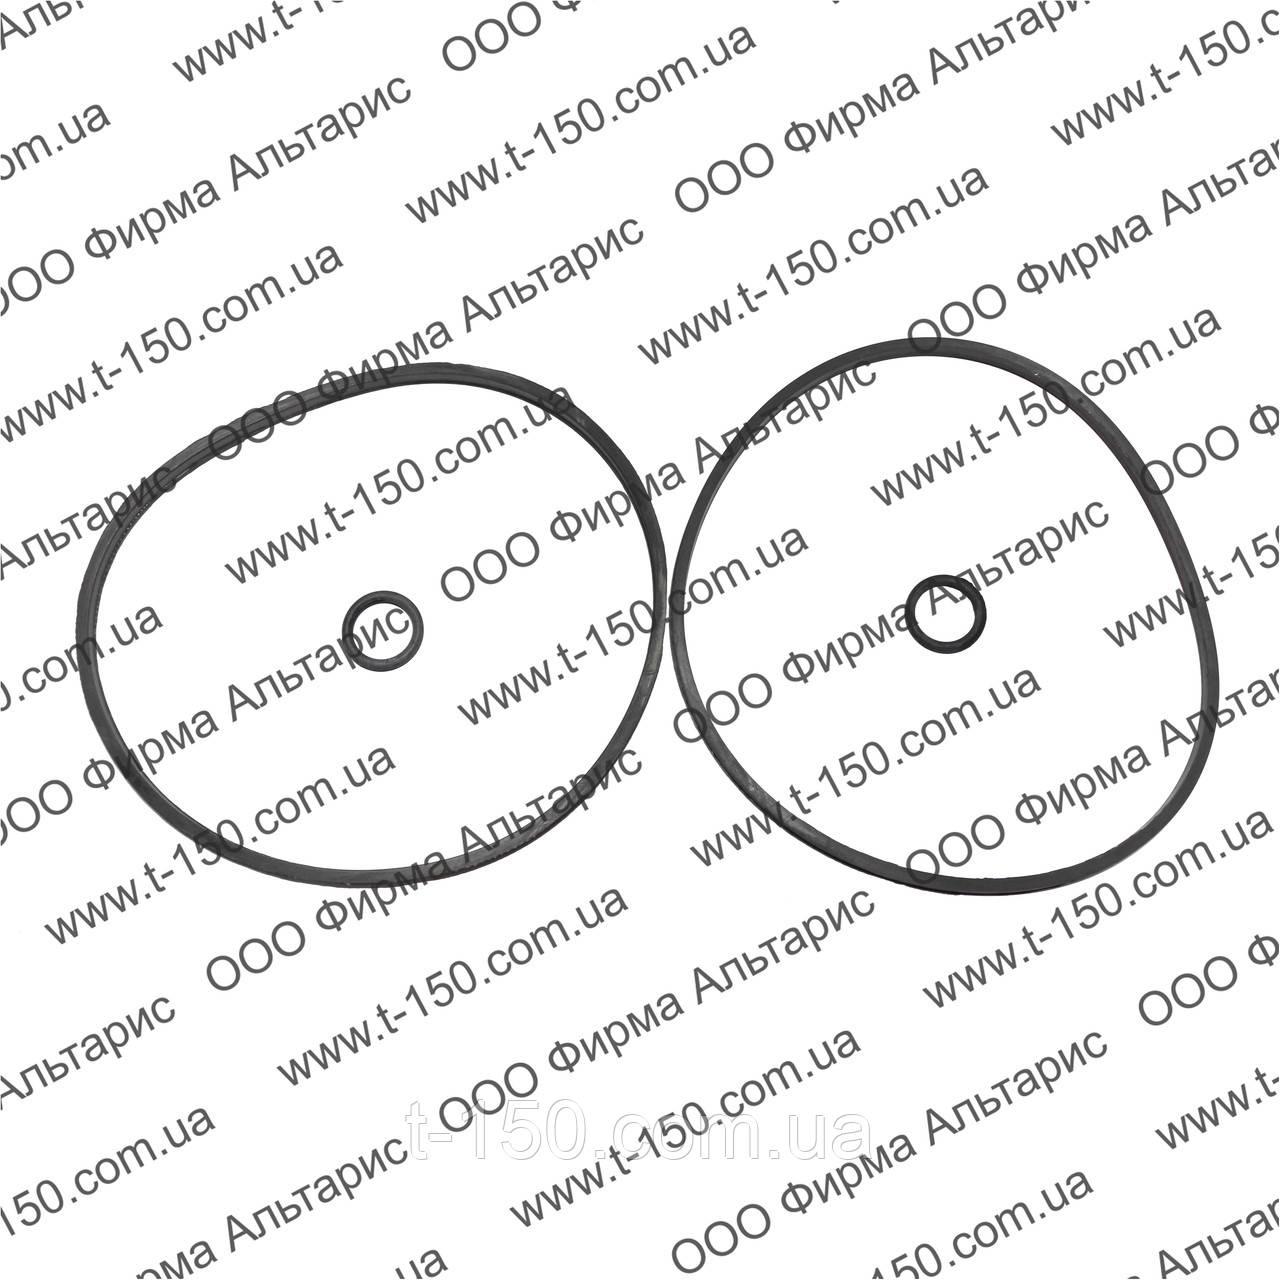 Ремкомплект фільтра грубої очистки масла КАМАЗ чорна гума